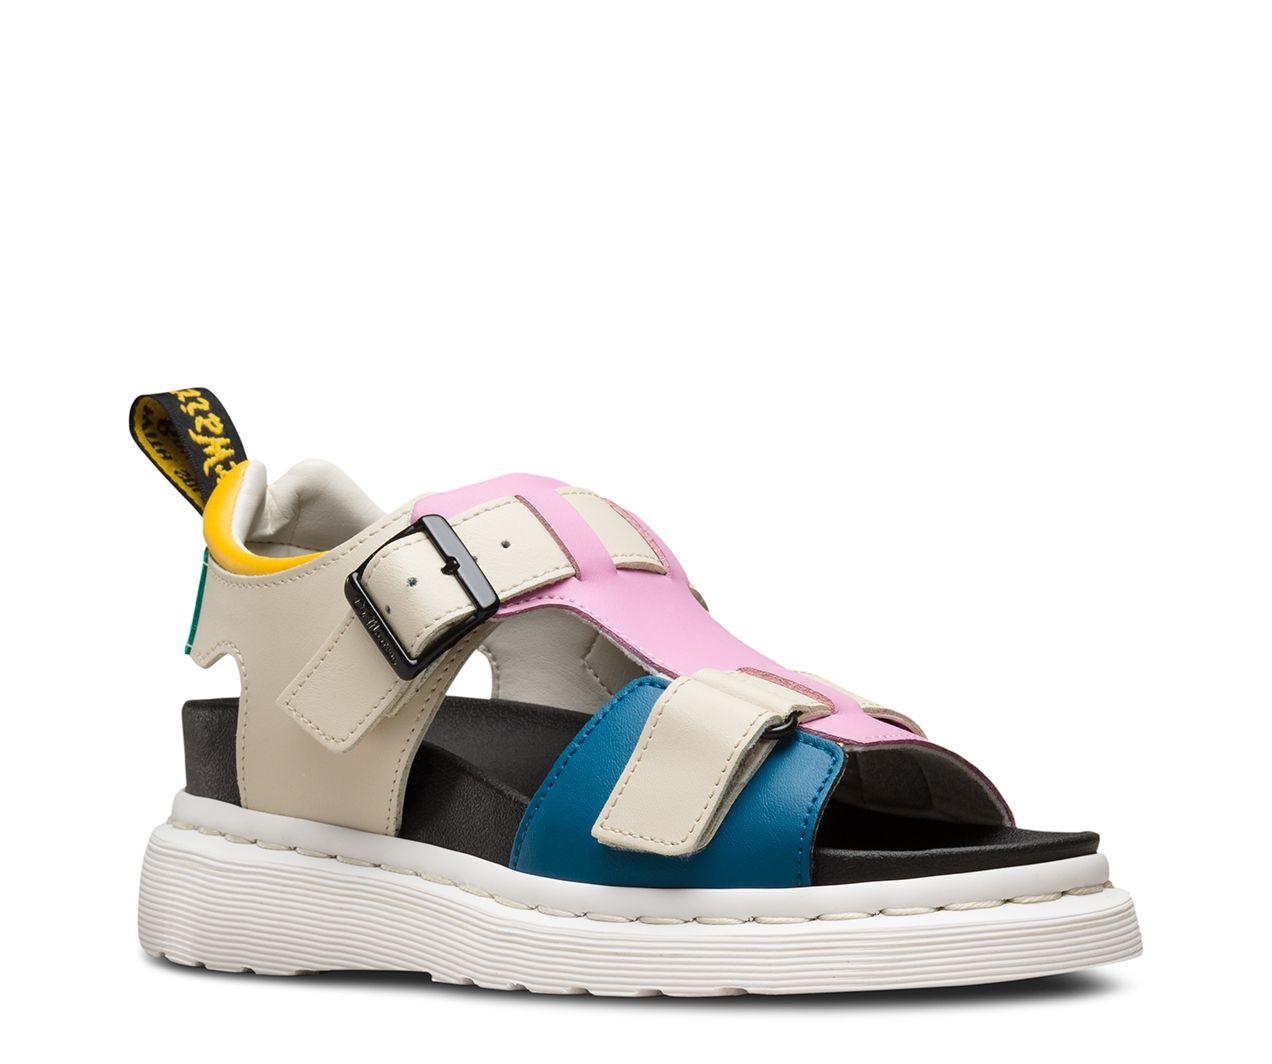 sandalsDr store martens Dr kamilahShoesBlue martens PXZiuTOk